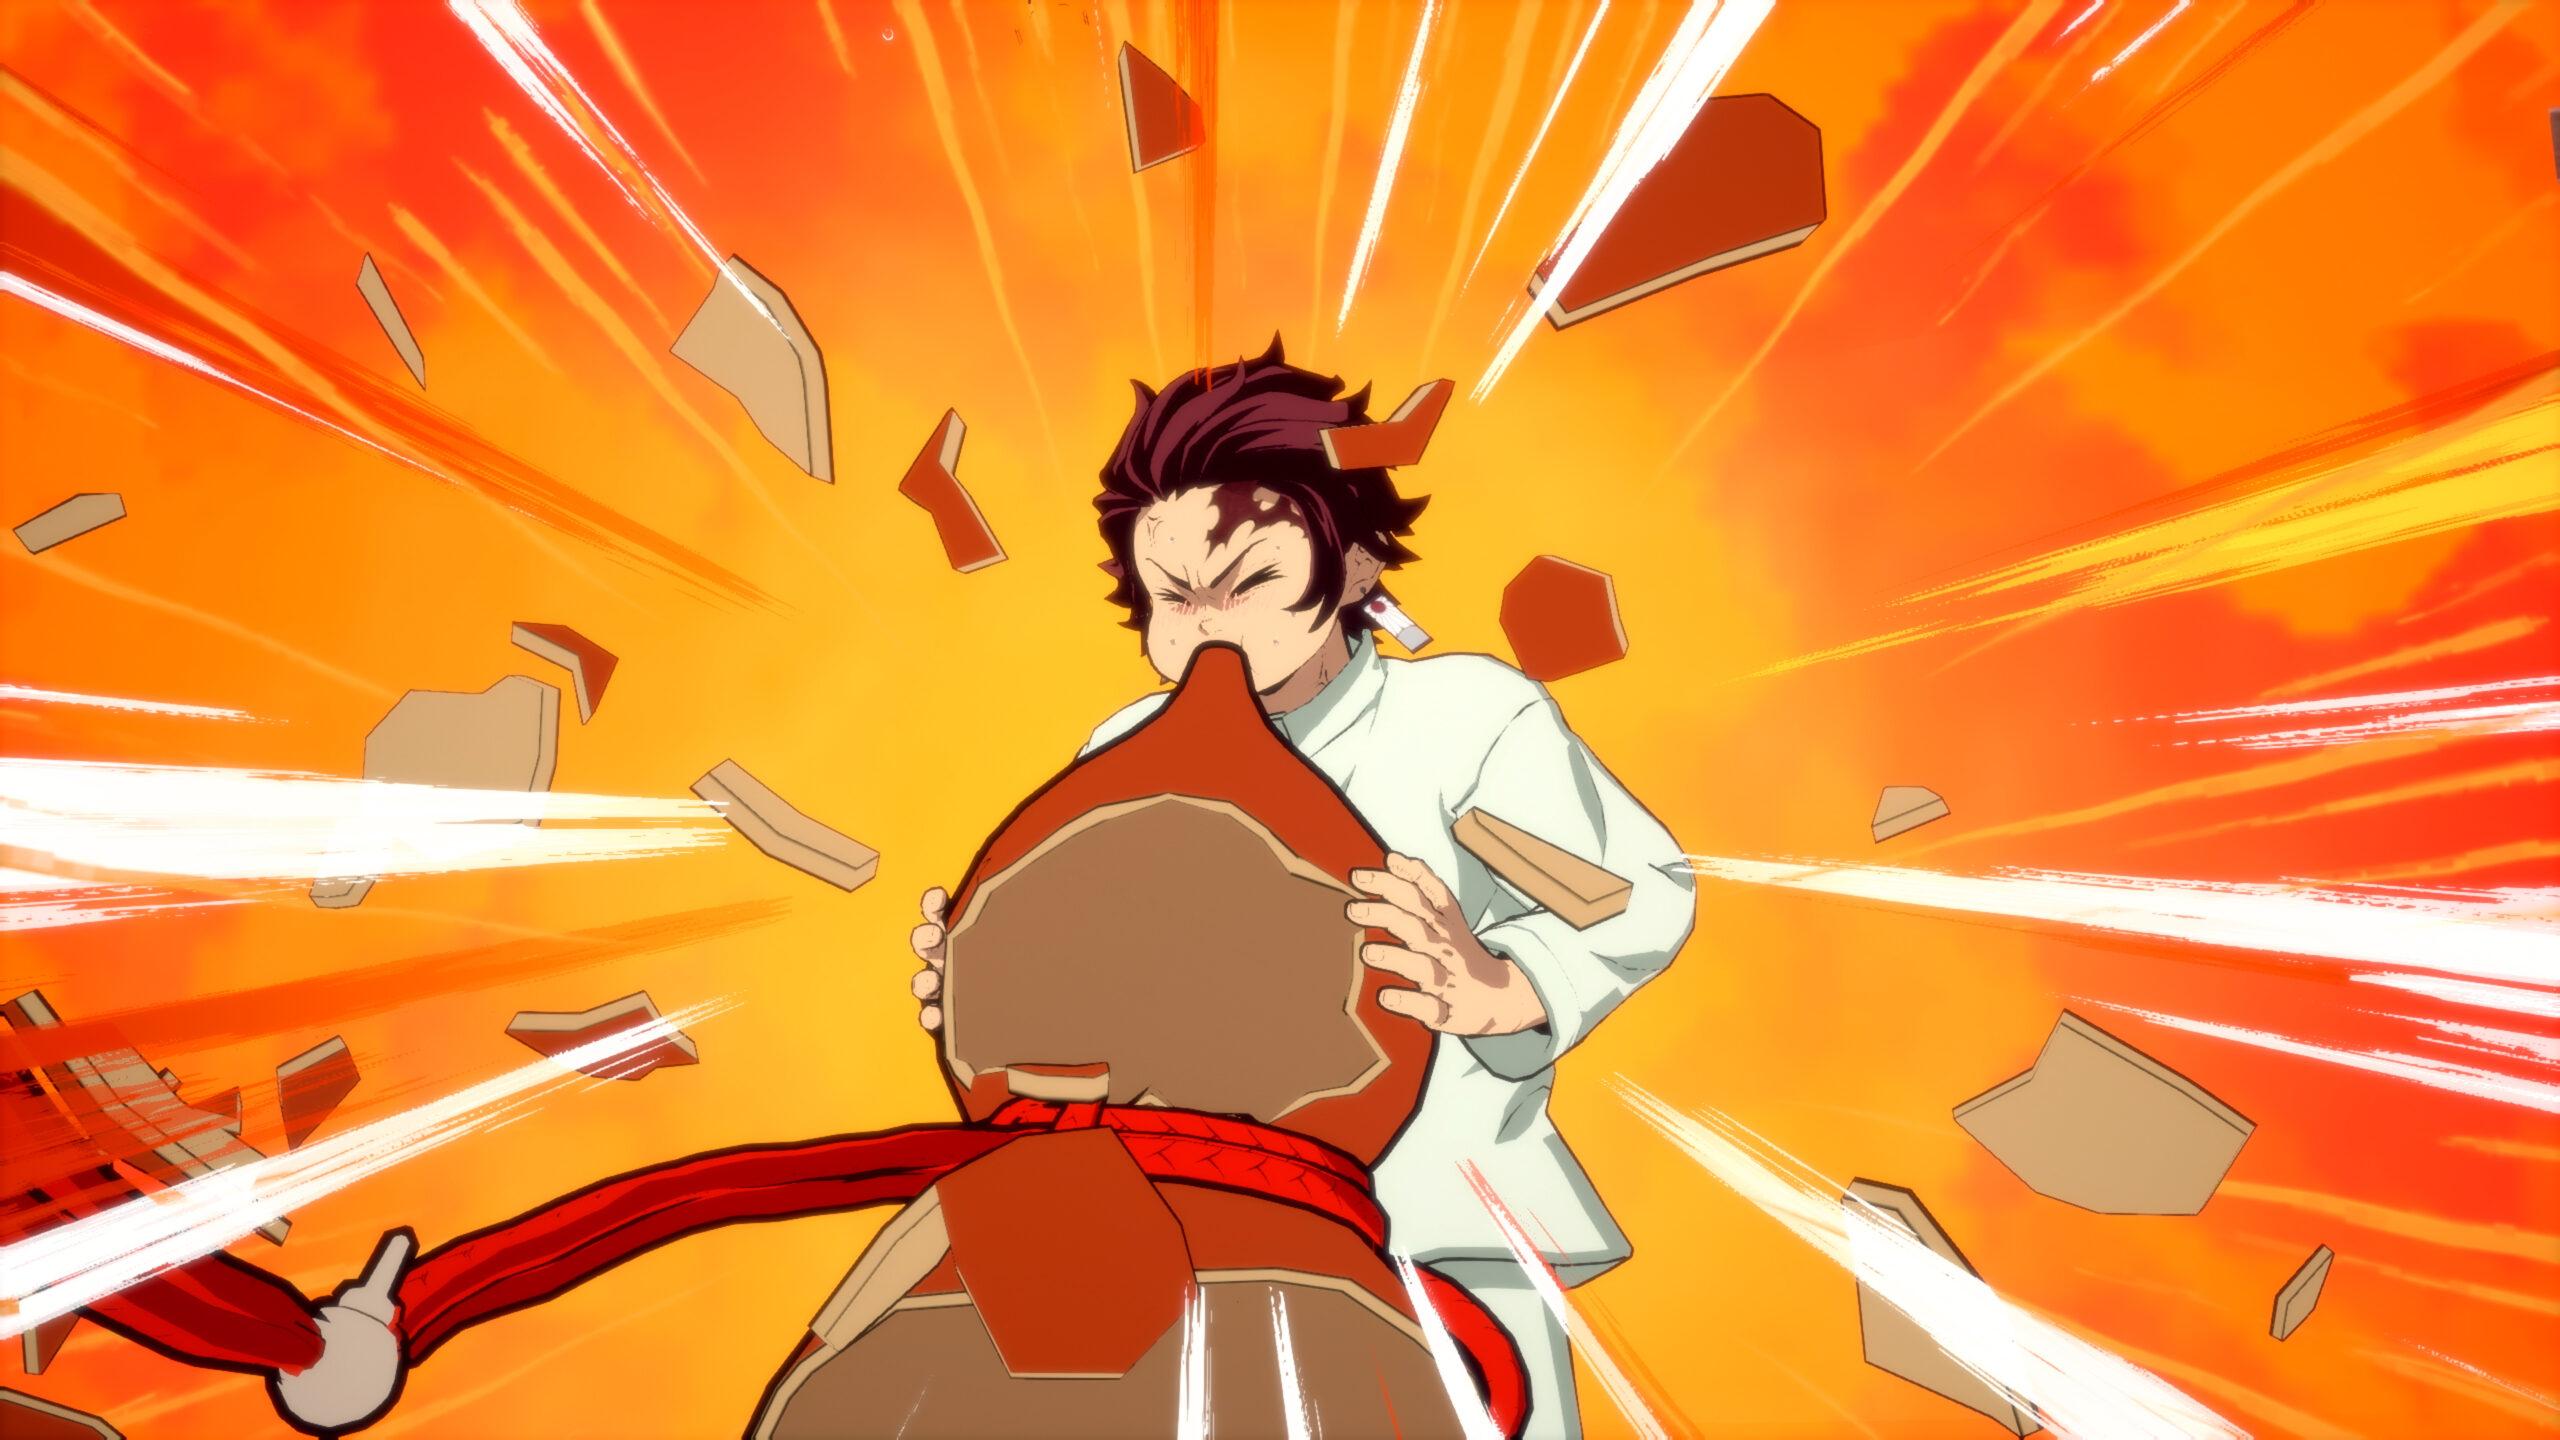 Demon Slayer Kimetsu no Yaiba The Hinokami Chronicles 2021 09 10 21 003 scaled